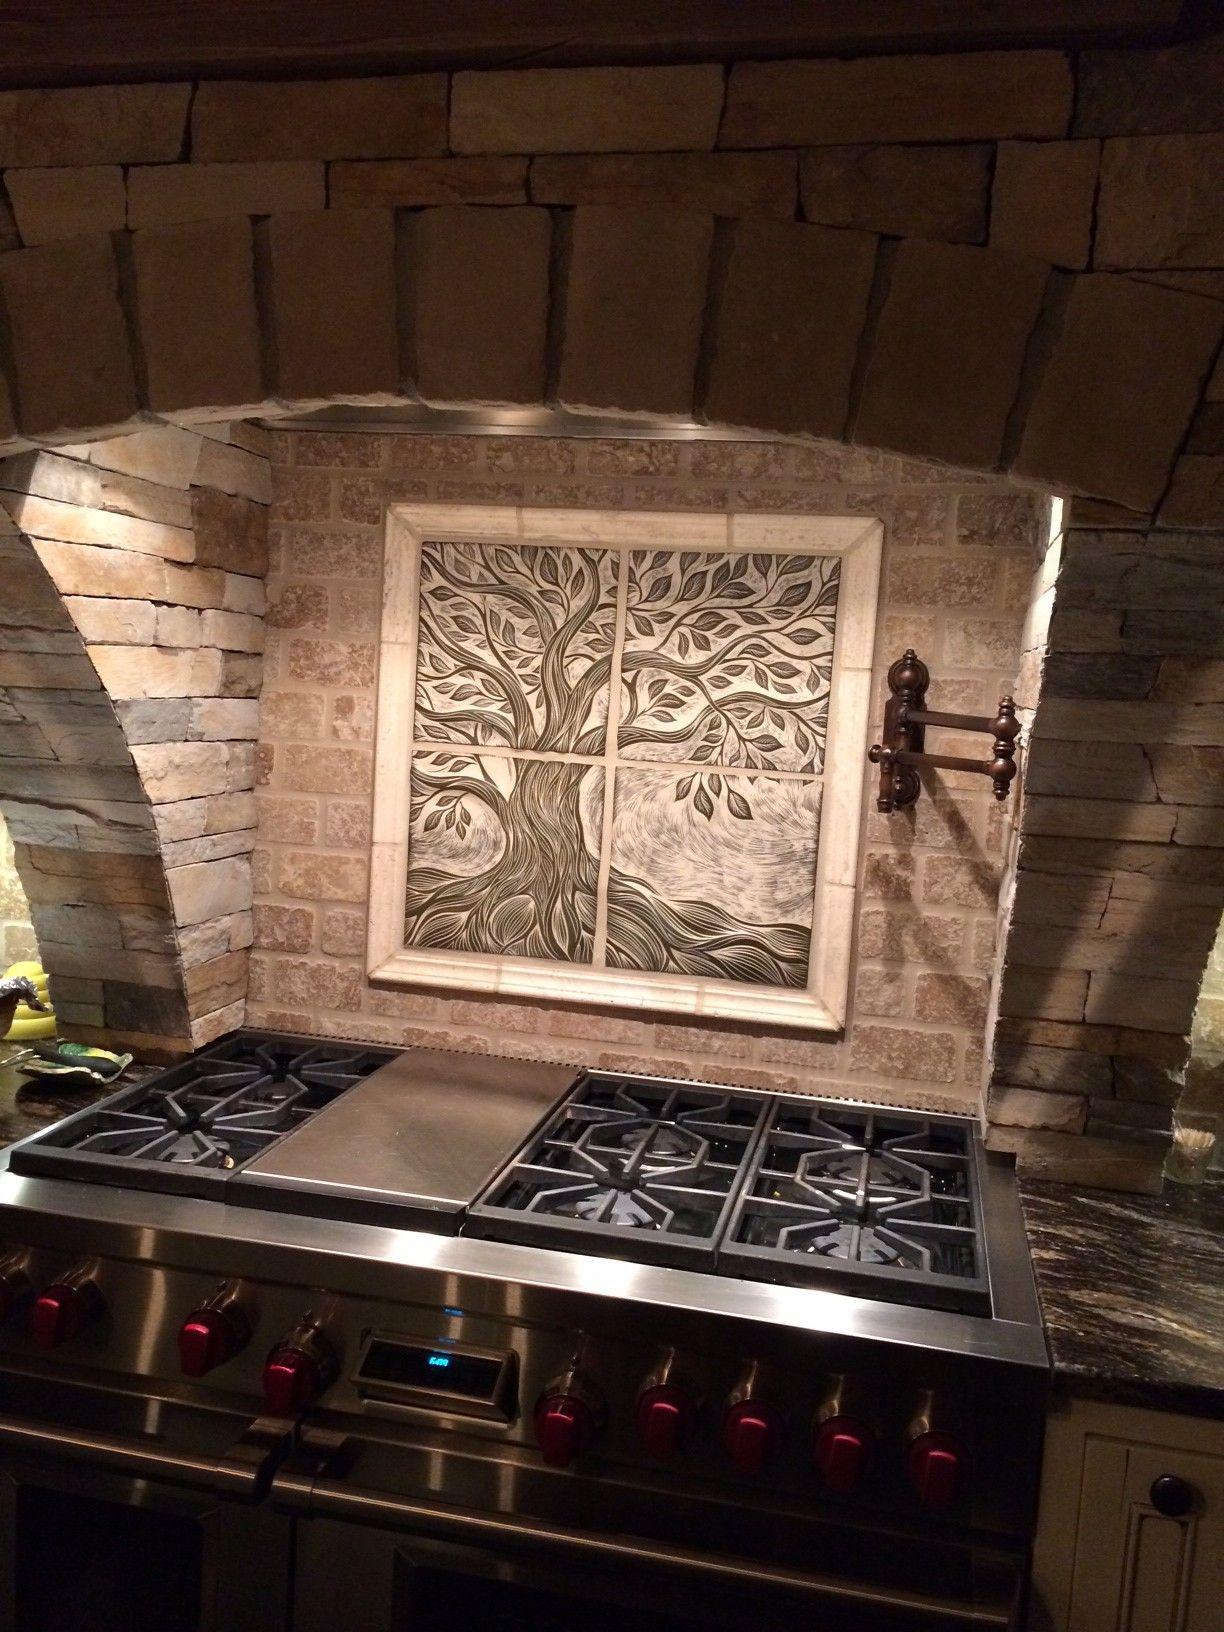 Handmade sgraffito carved ceramic backsplash tile the nest pinterest sgraffito - Ceramic tile backsplash designs ...